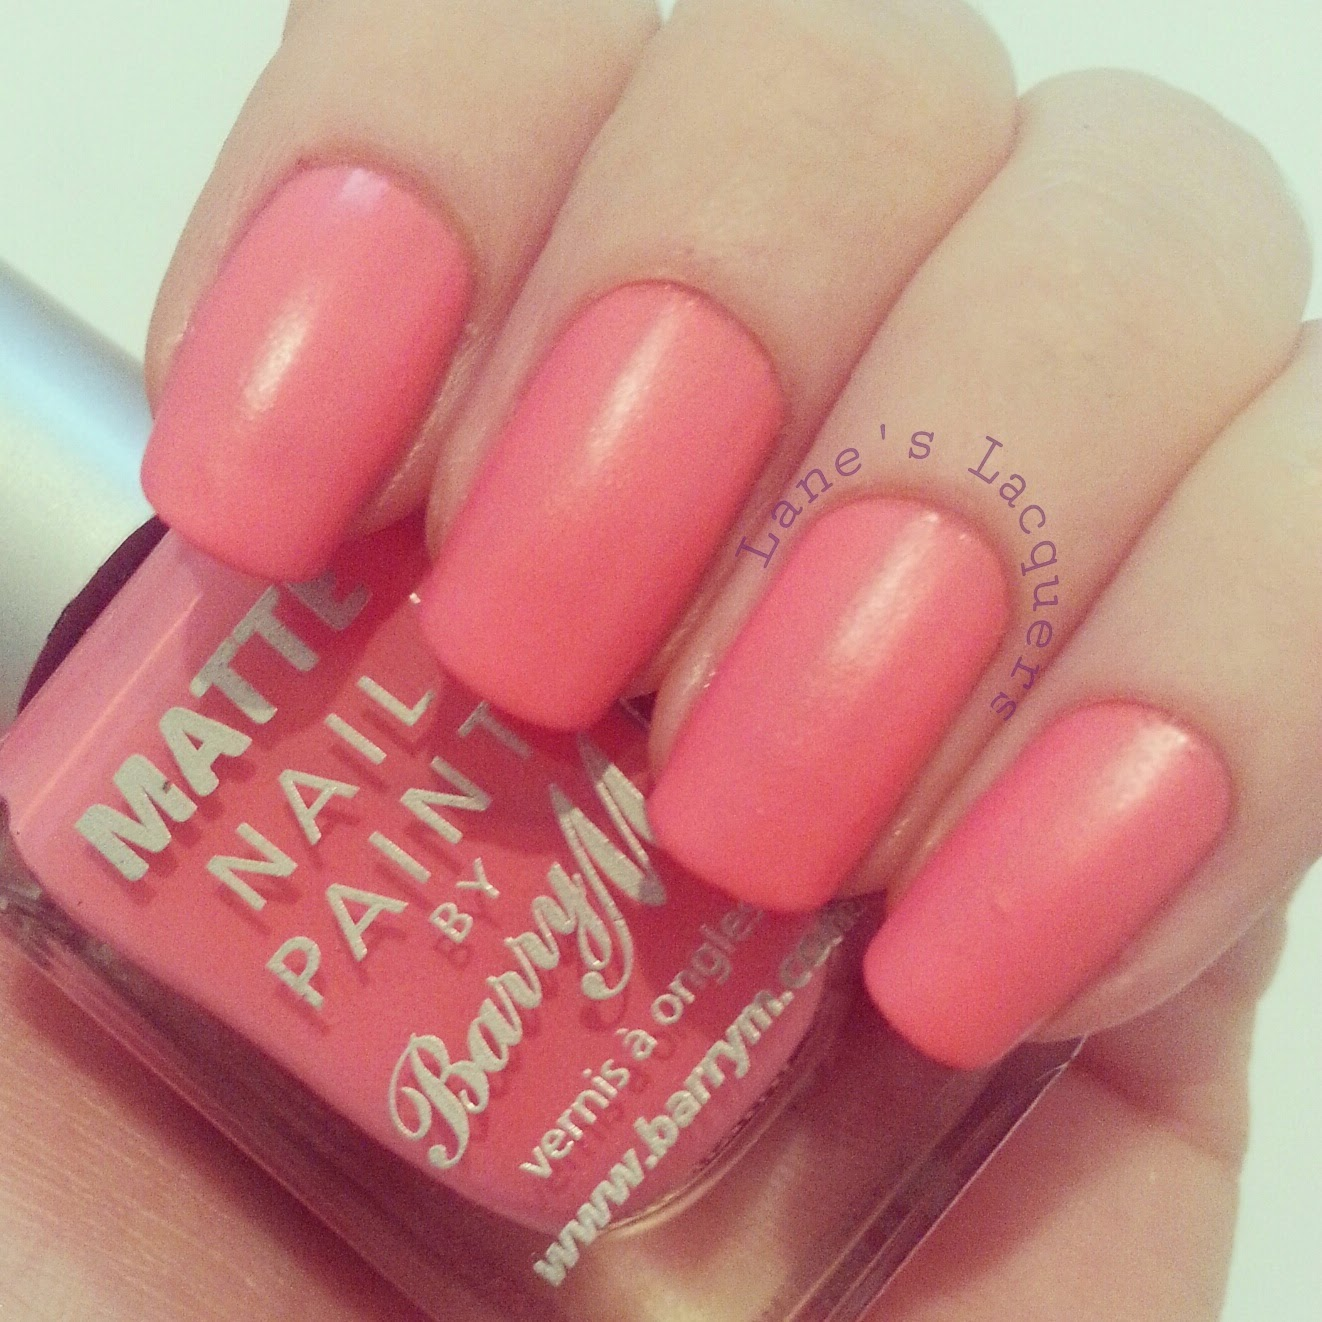 barry-m-miami-swatch-manicure (2)